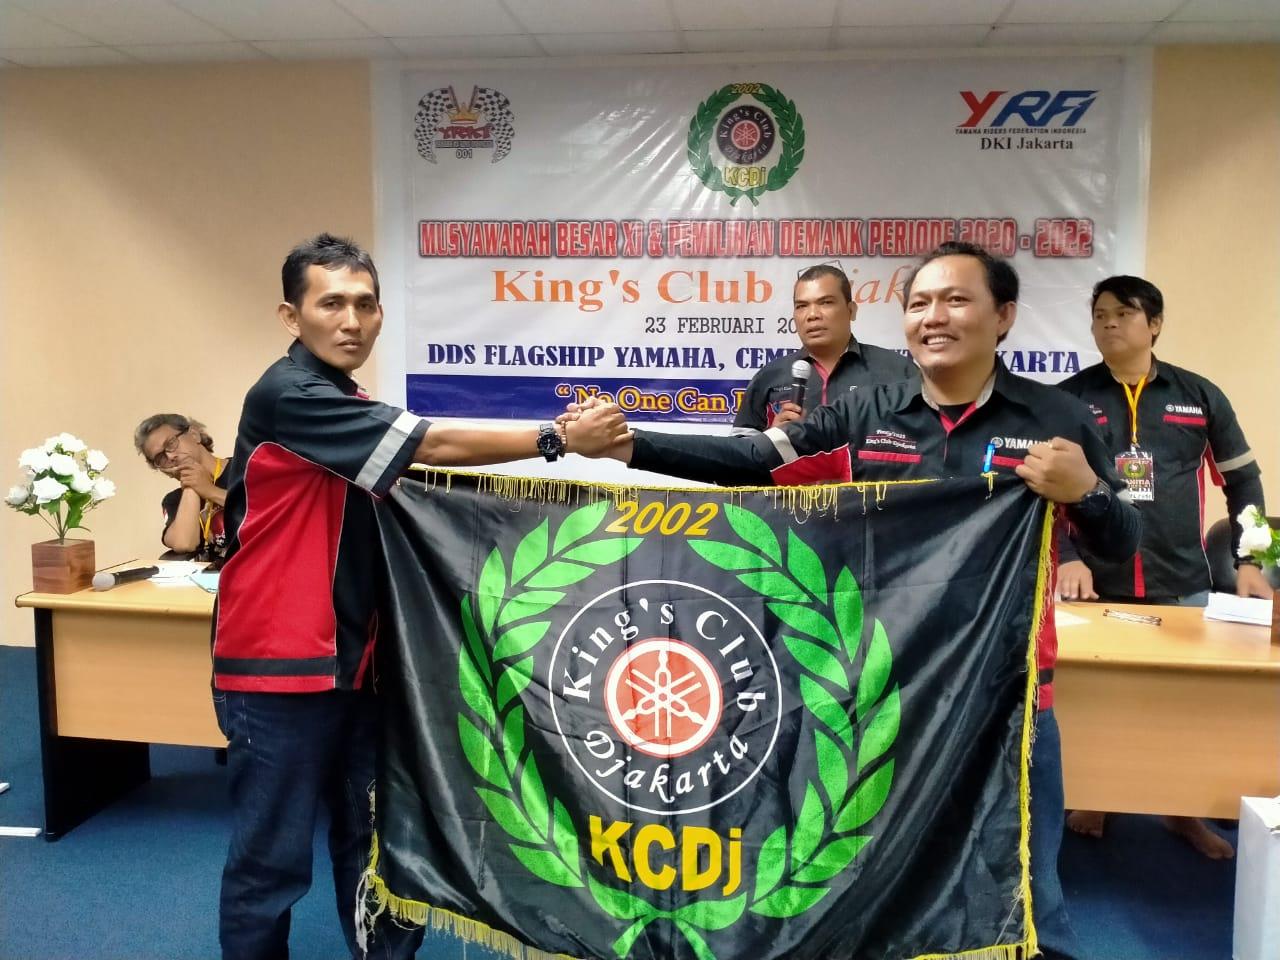 Mubes King's Club Djakarta (KCDj) 2020 Dihadiri Presiden Yamaha RX-King Indonesia (YRKI)